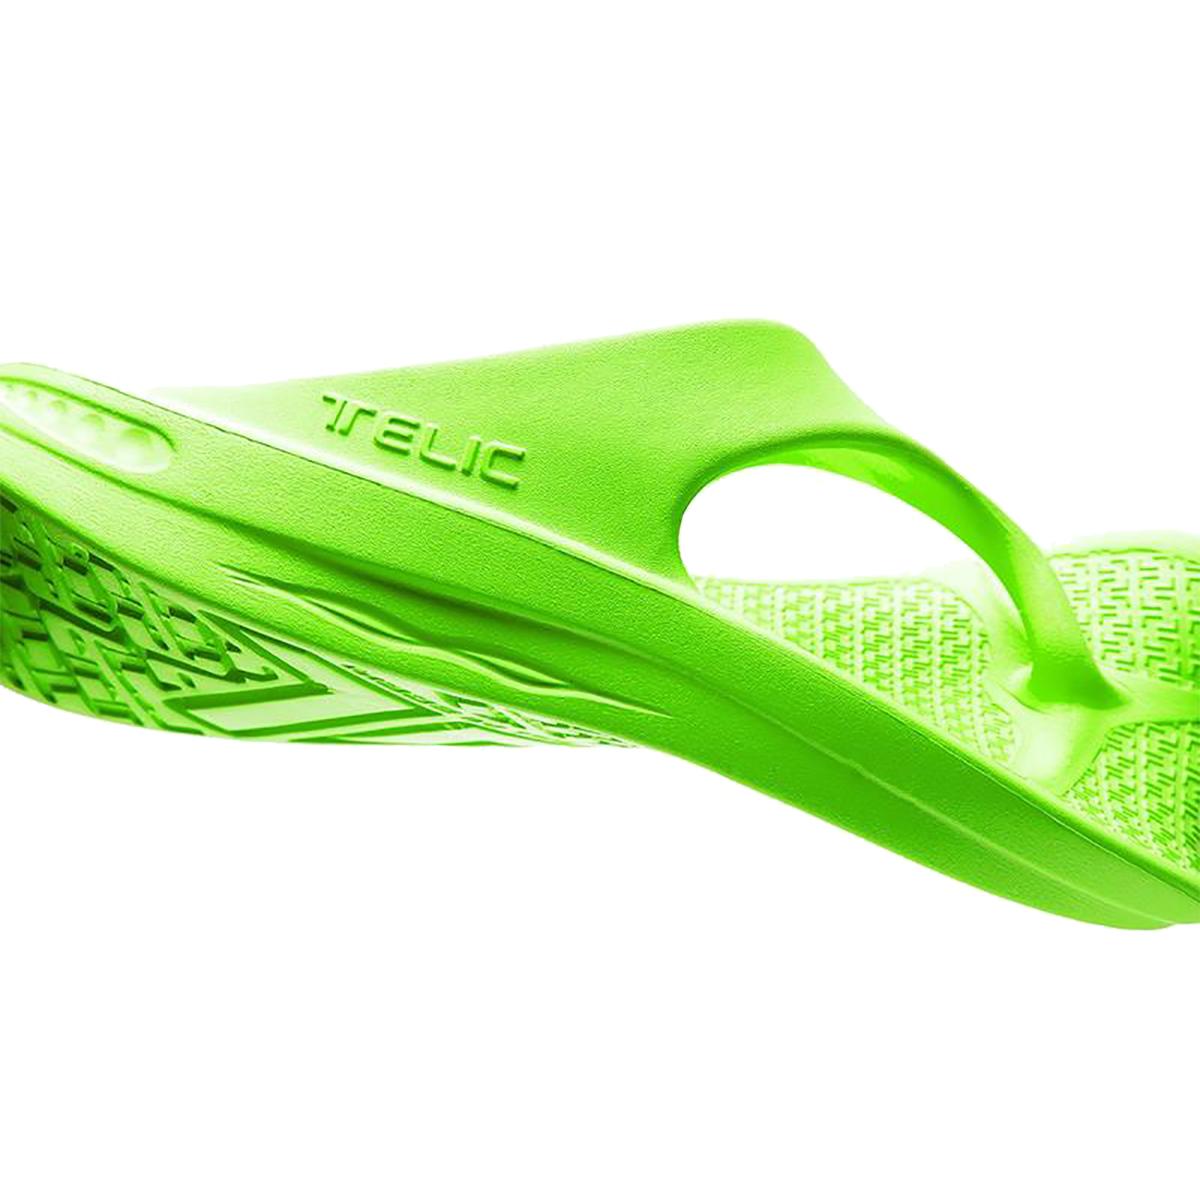 Telic-Unisex-Signature-Style-Arch-Support-Pain-Relief-Flip-Flops thumbnail 25